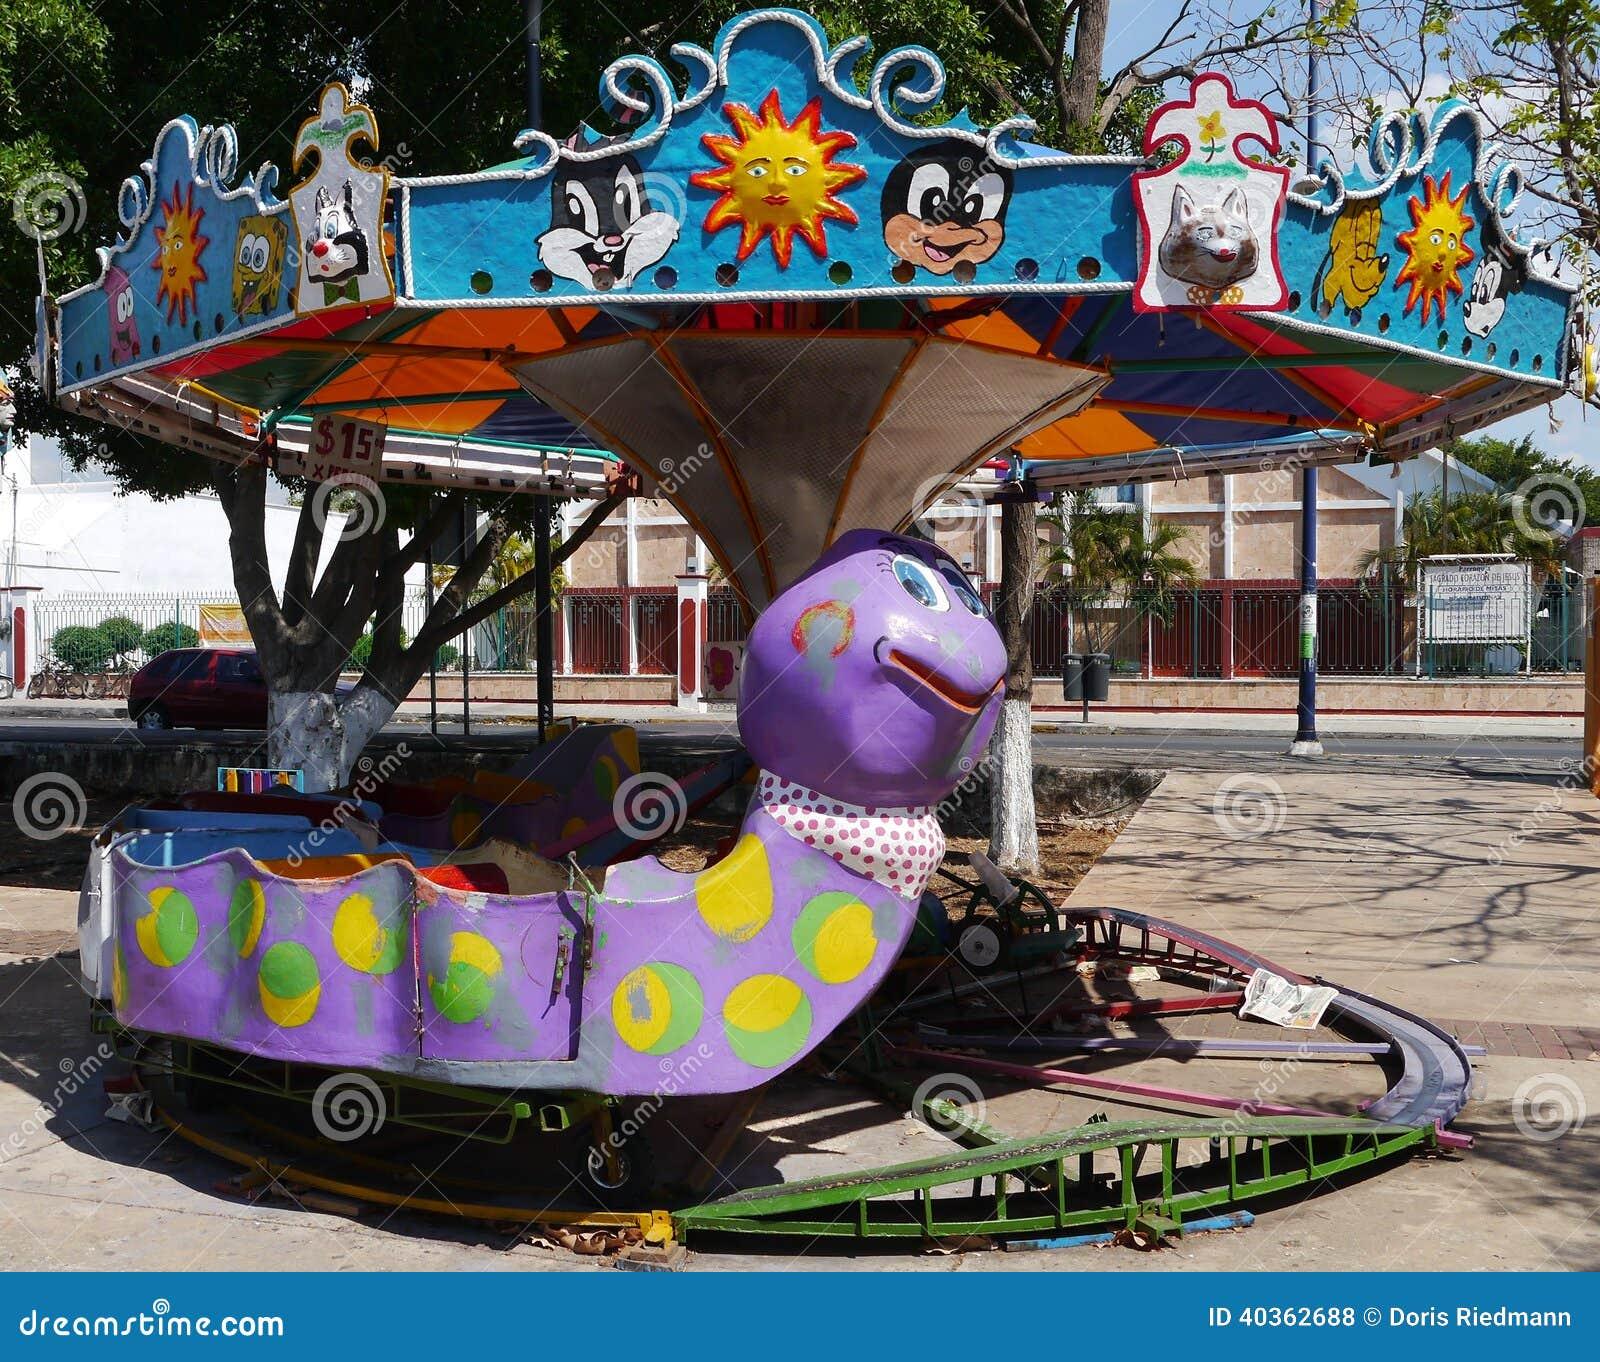 Funfair Playground Kermis Children Fun Stock Photo Image